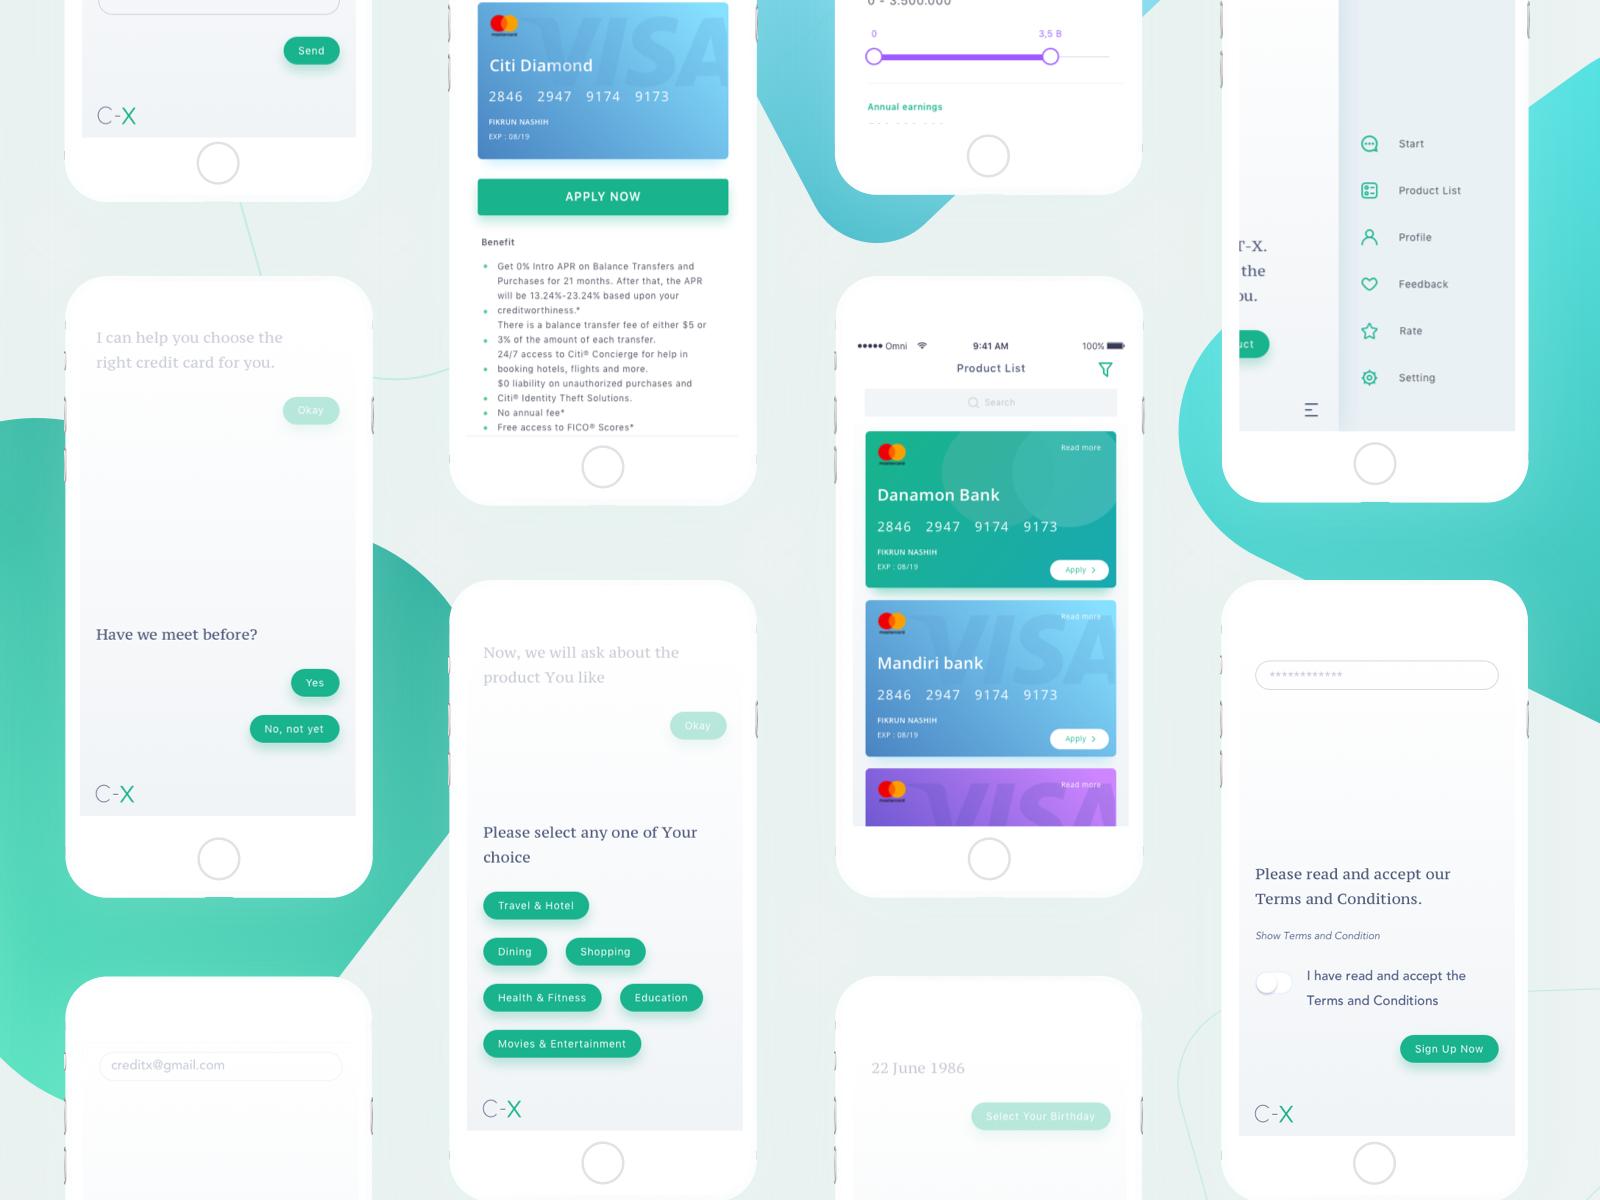 Credit App Anggityuniar Omnicreativora Attachment Web App Design Mobile Web Design Chatbot Design